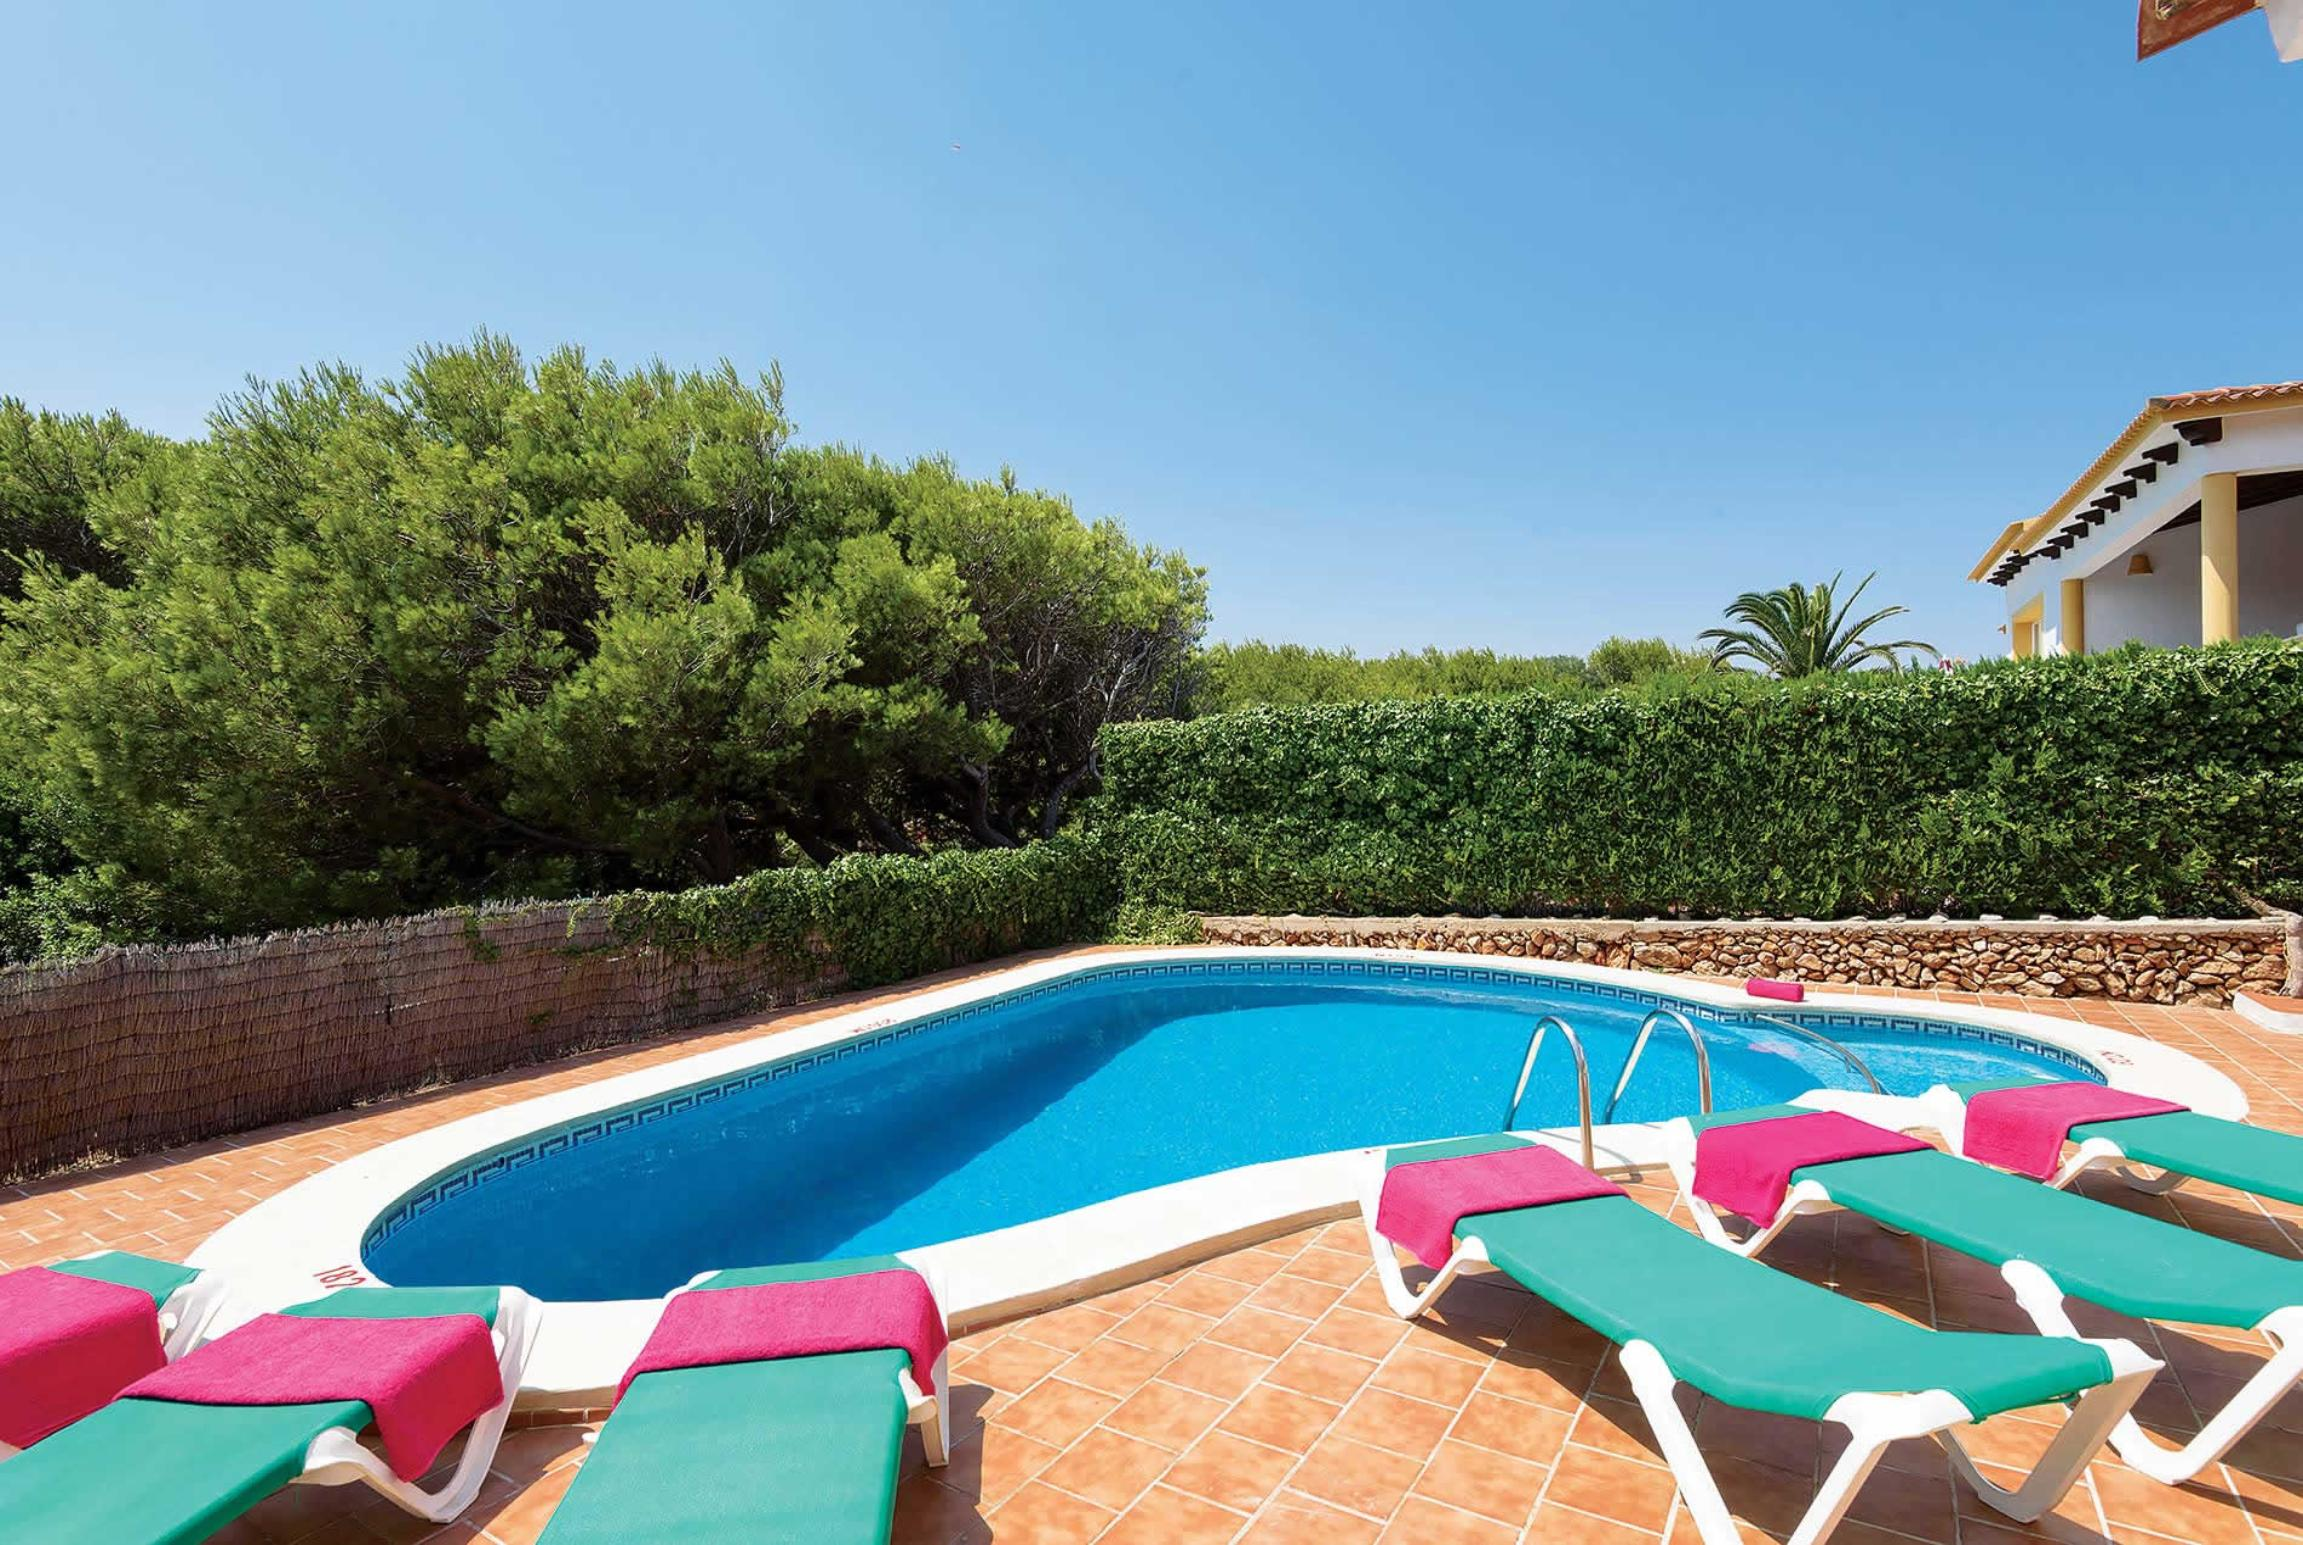 Ferienhaus Eulalia II (2653368), Arenal De'N Castell, Menorca, Balearische Inseln, Spanien, Bild 2